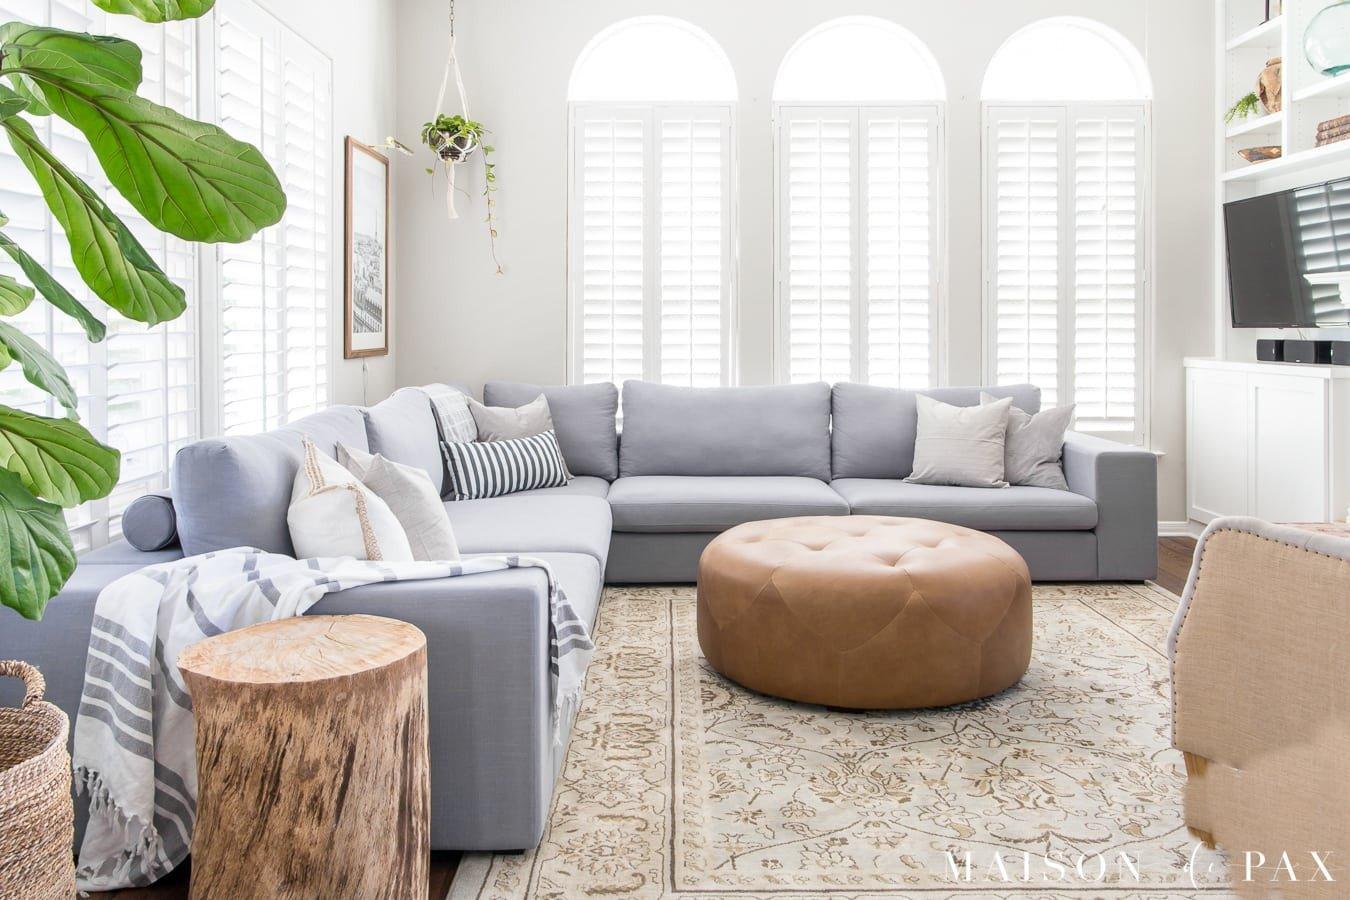 Small Living Room Ideas Sectionals Beautiful Designing A Small Living Room with A Sectional Maison De Pax